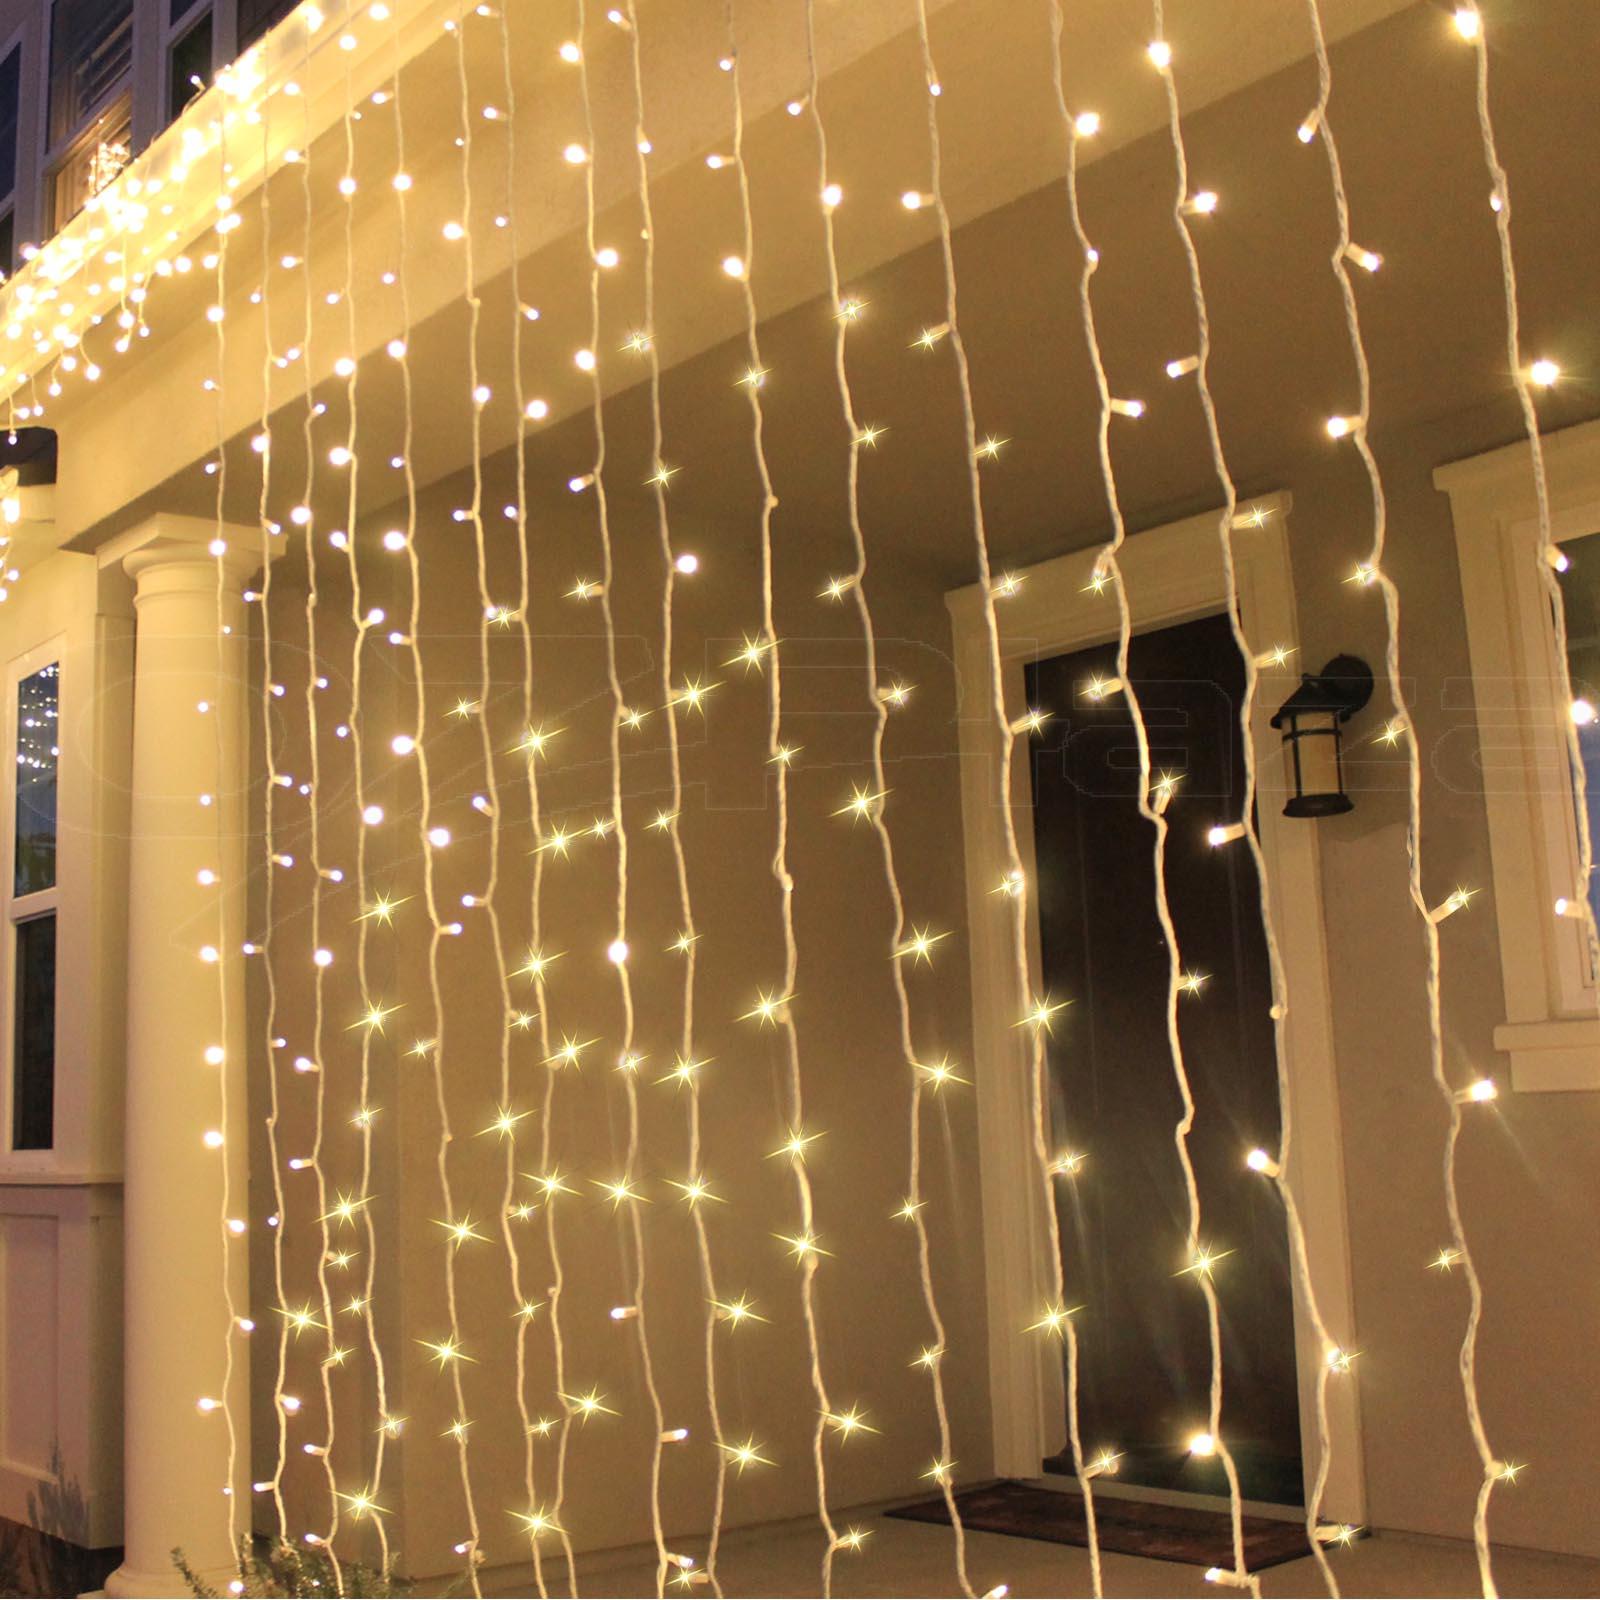 600 Led Christmas Curtain Lights Decorations Outdoor Fair Party Wedding Lighting Ebay